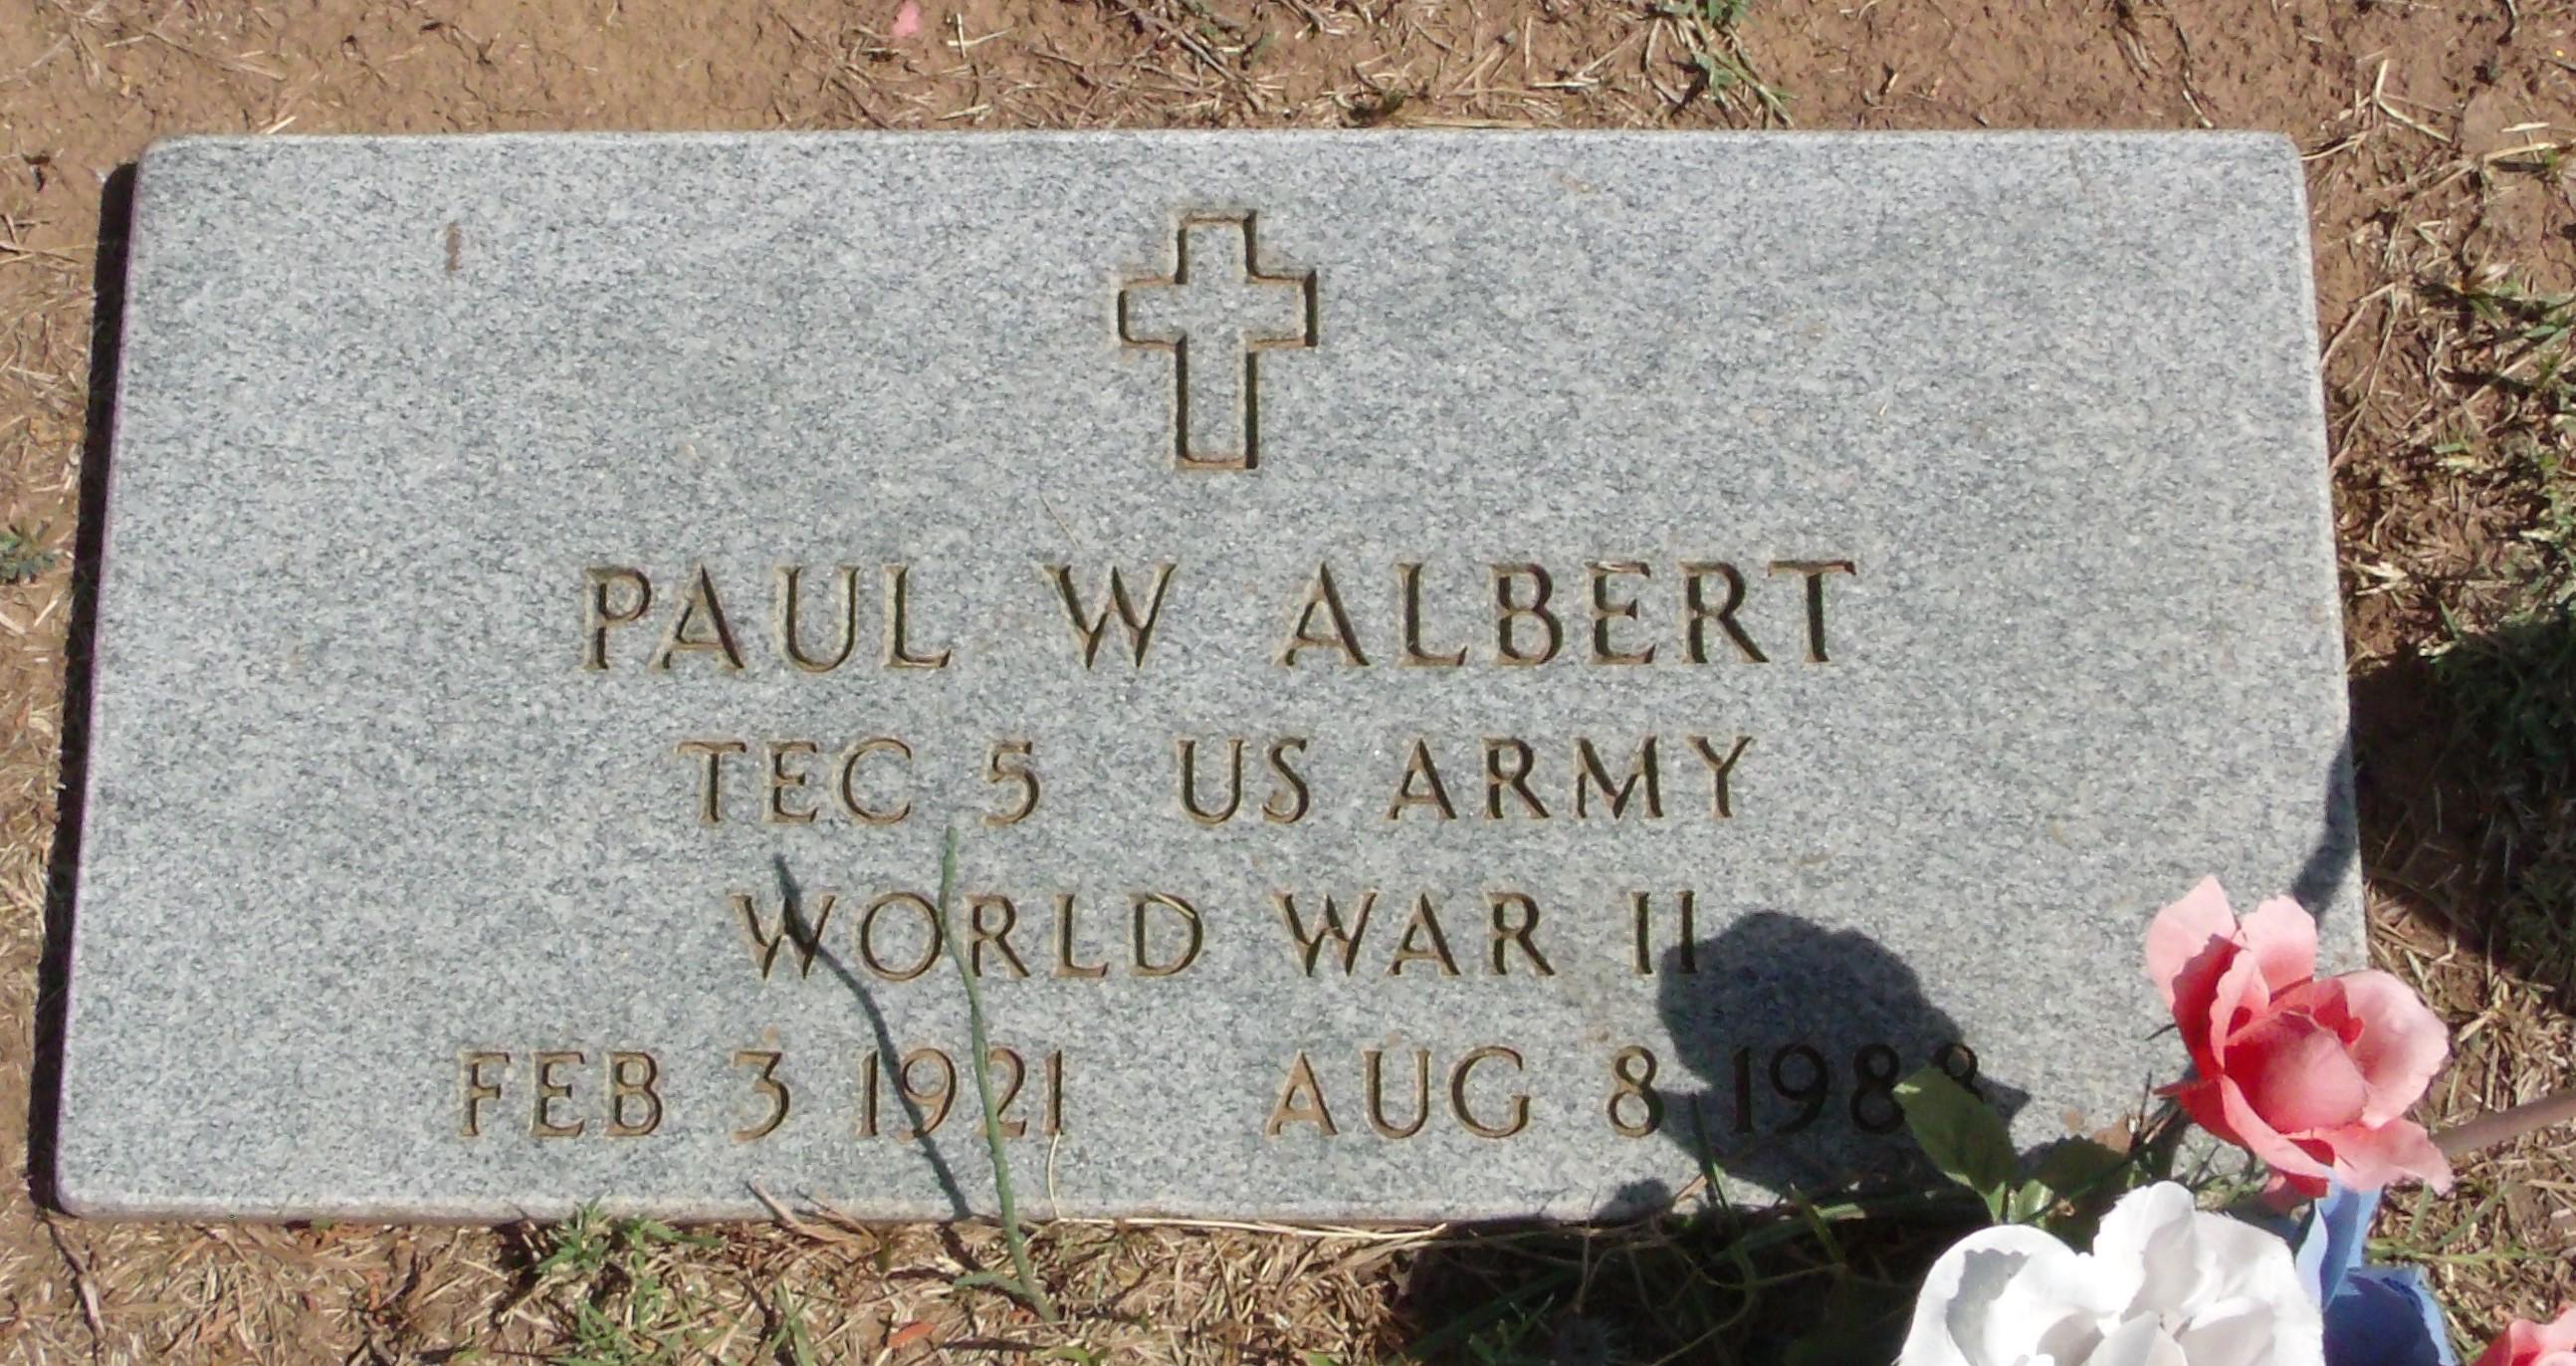 Paul W Albert